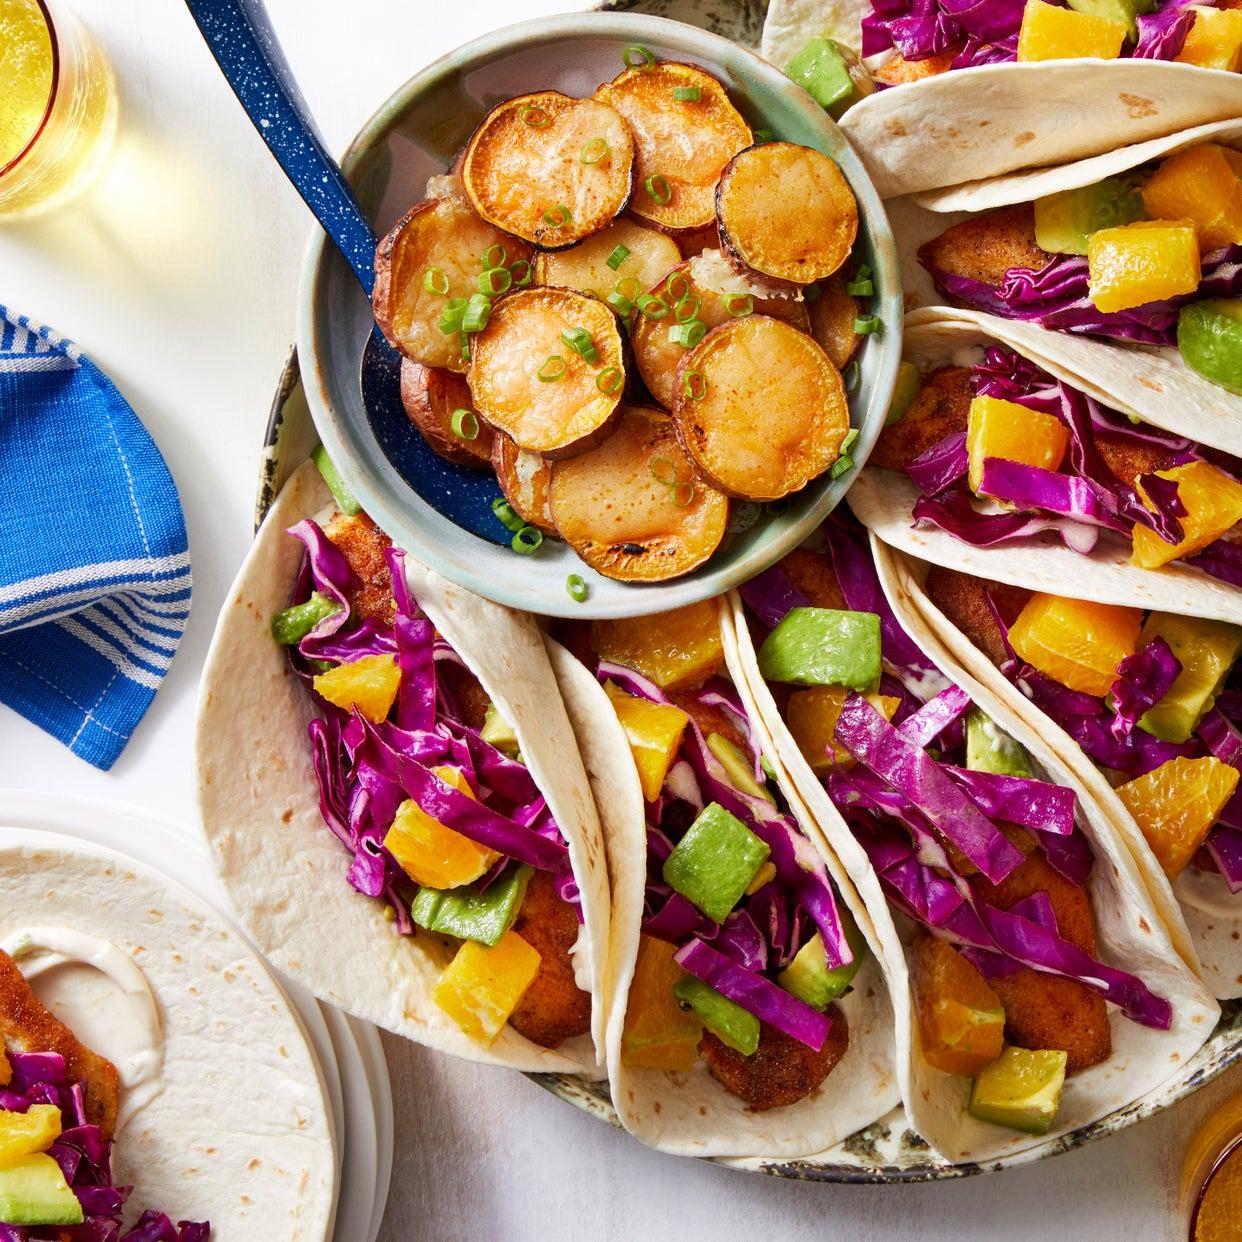 Forum on this topic: Mini Taco Salad Bowls, mini-taco-salad-bowls/